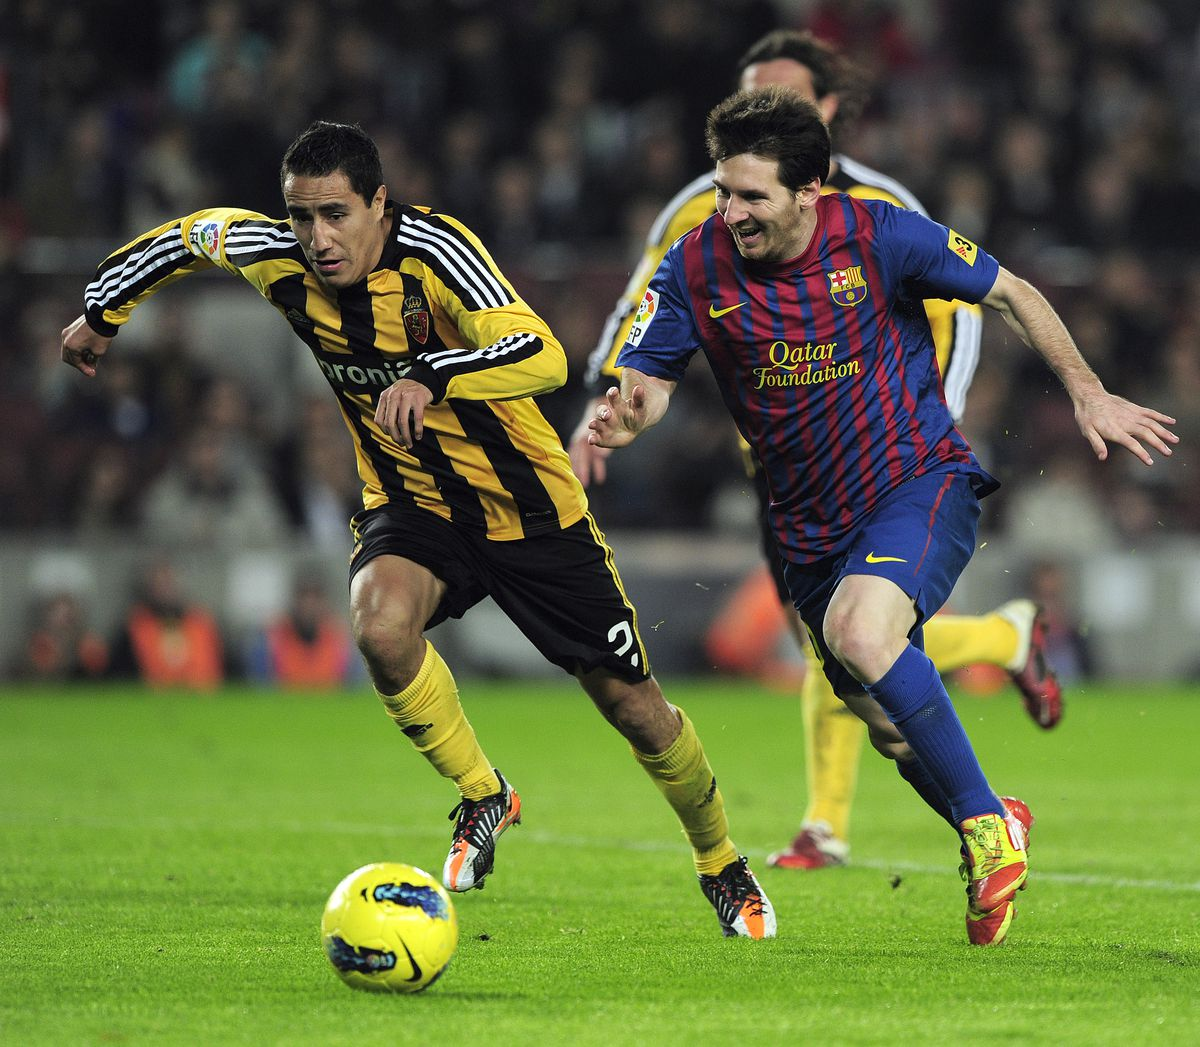 Zaragoza's Mexican defender Efrain Juare